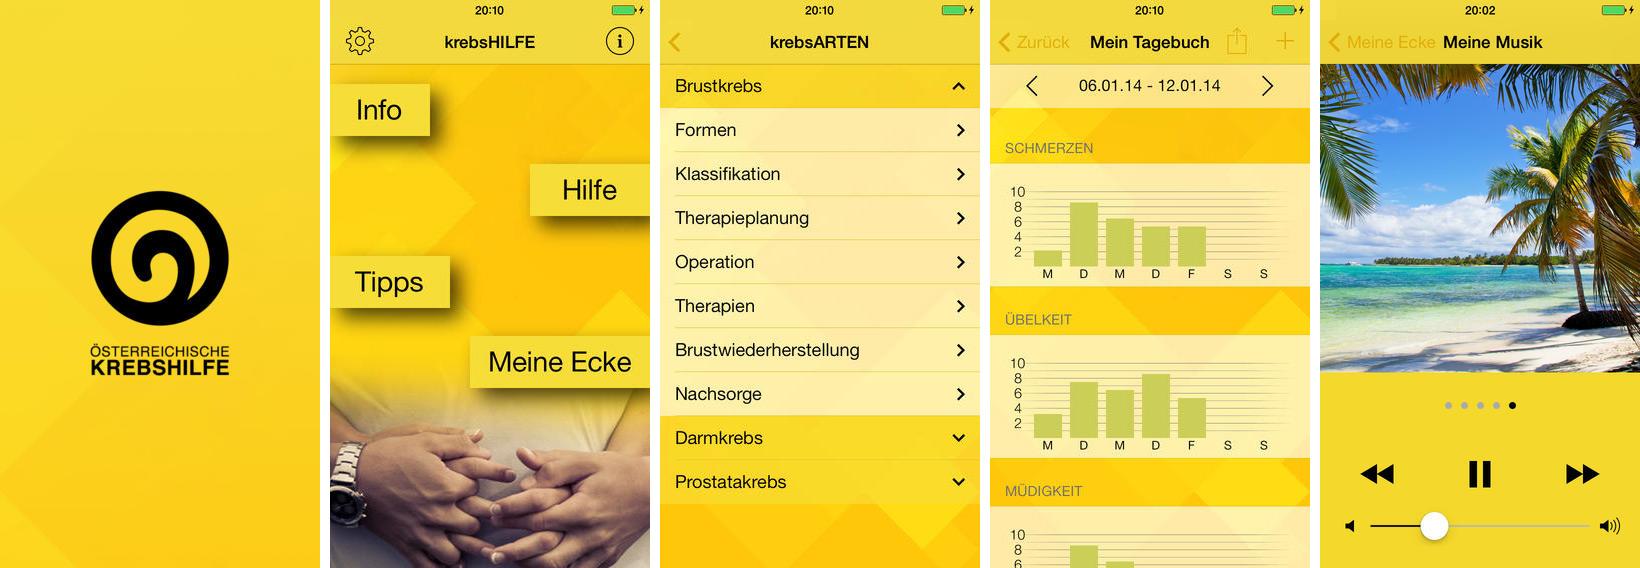 krebshilfe-screenshots